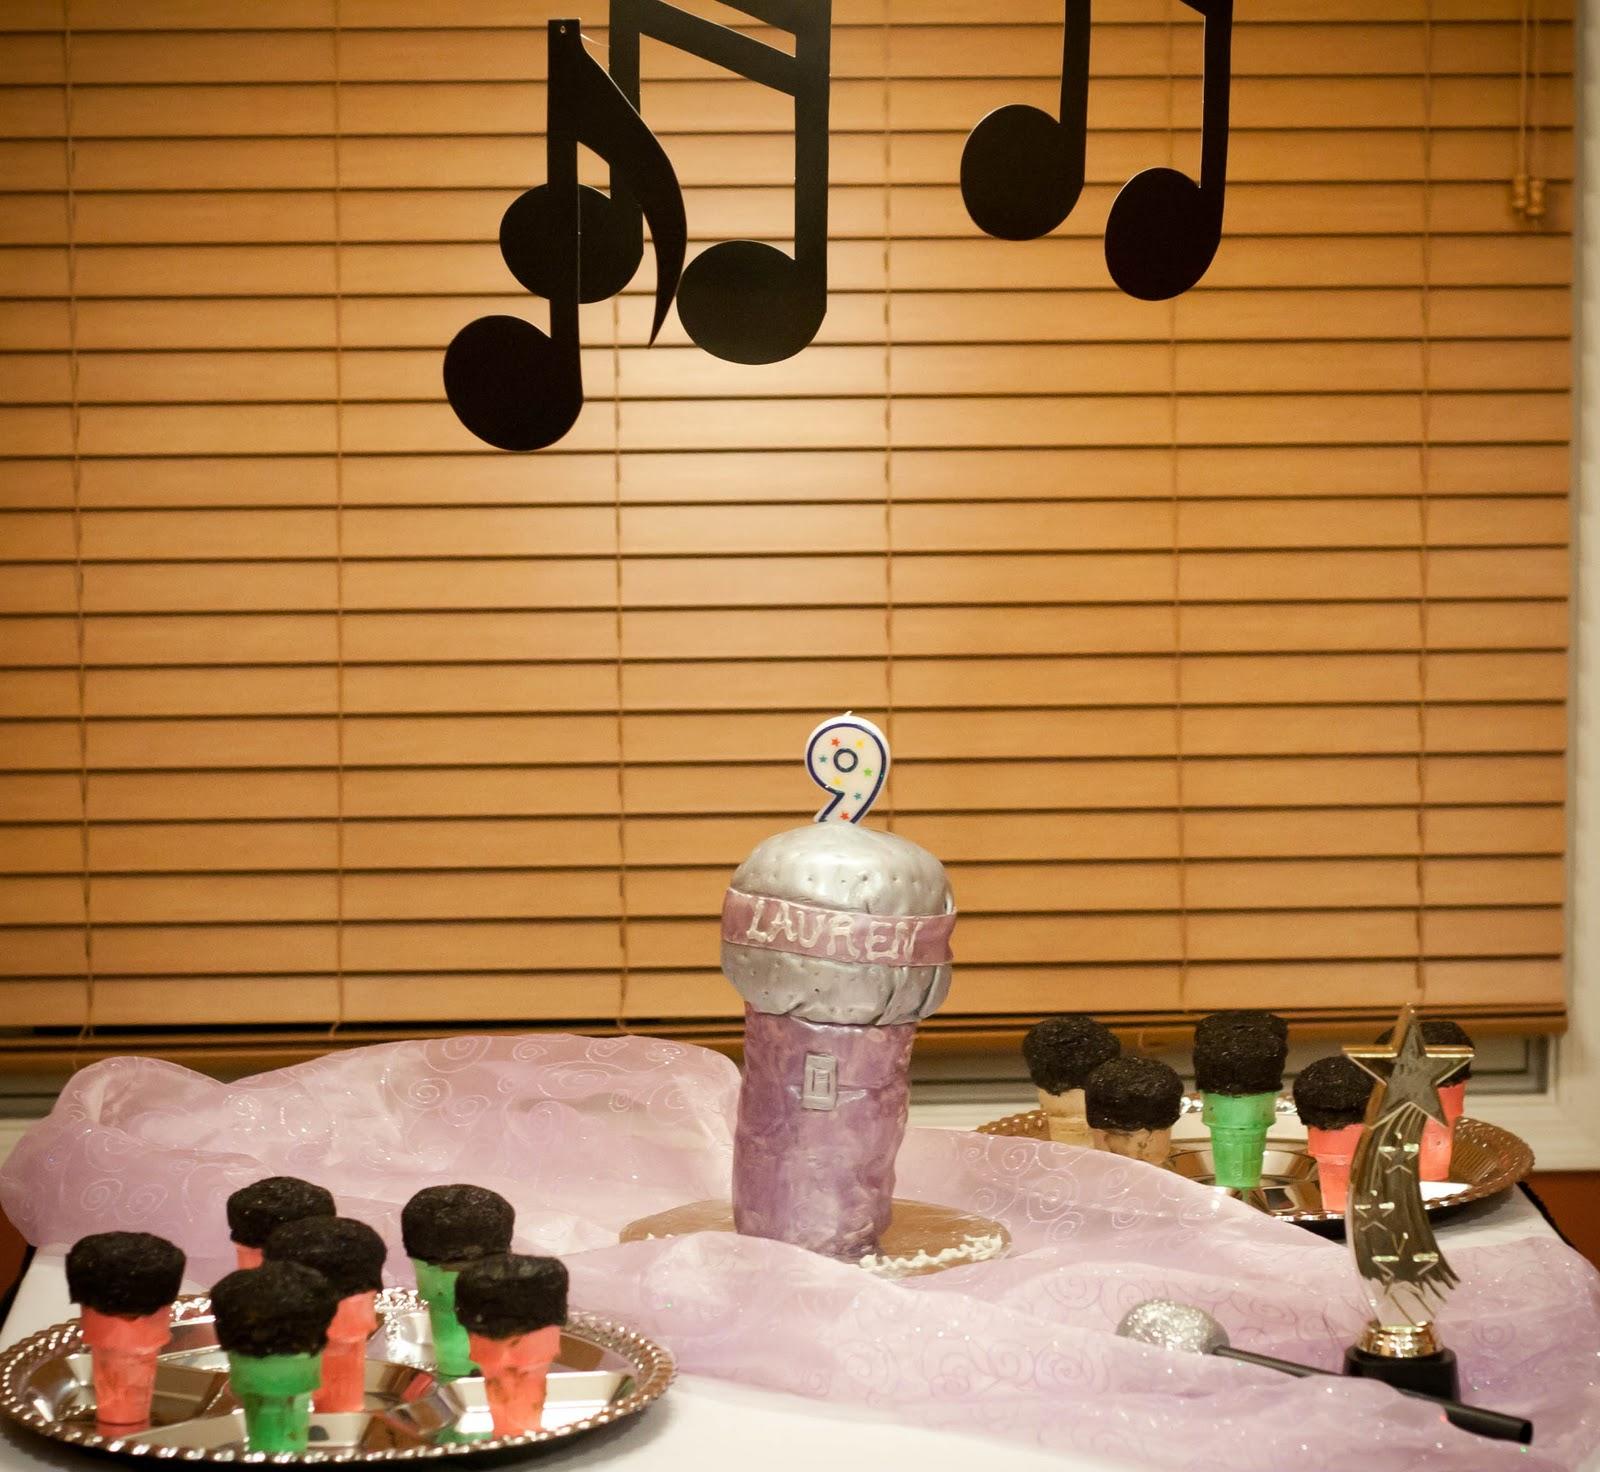 A Sing Ular Sensation Karaoke Birthday Party My Insanity